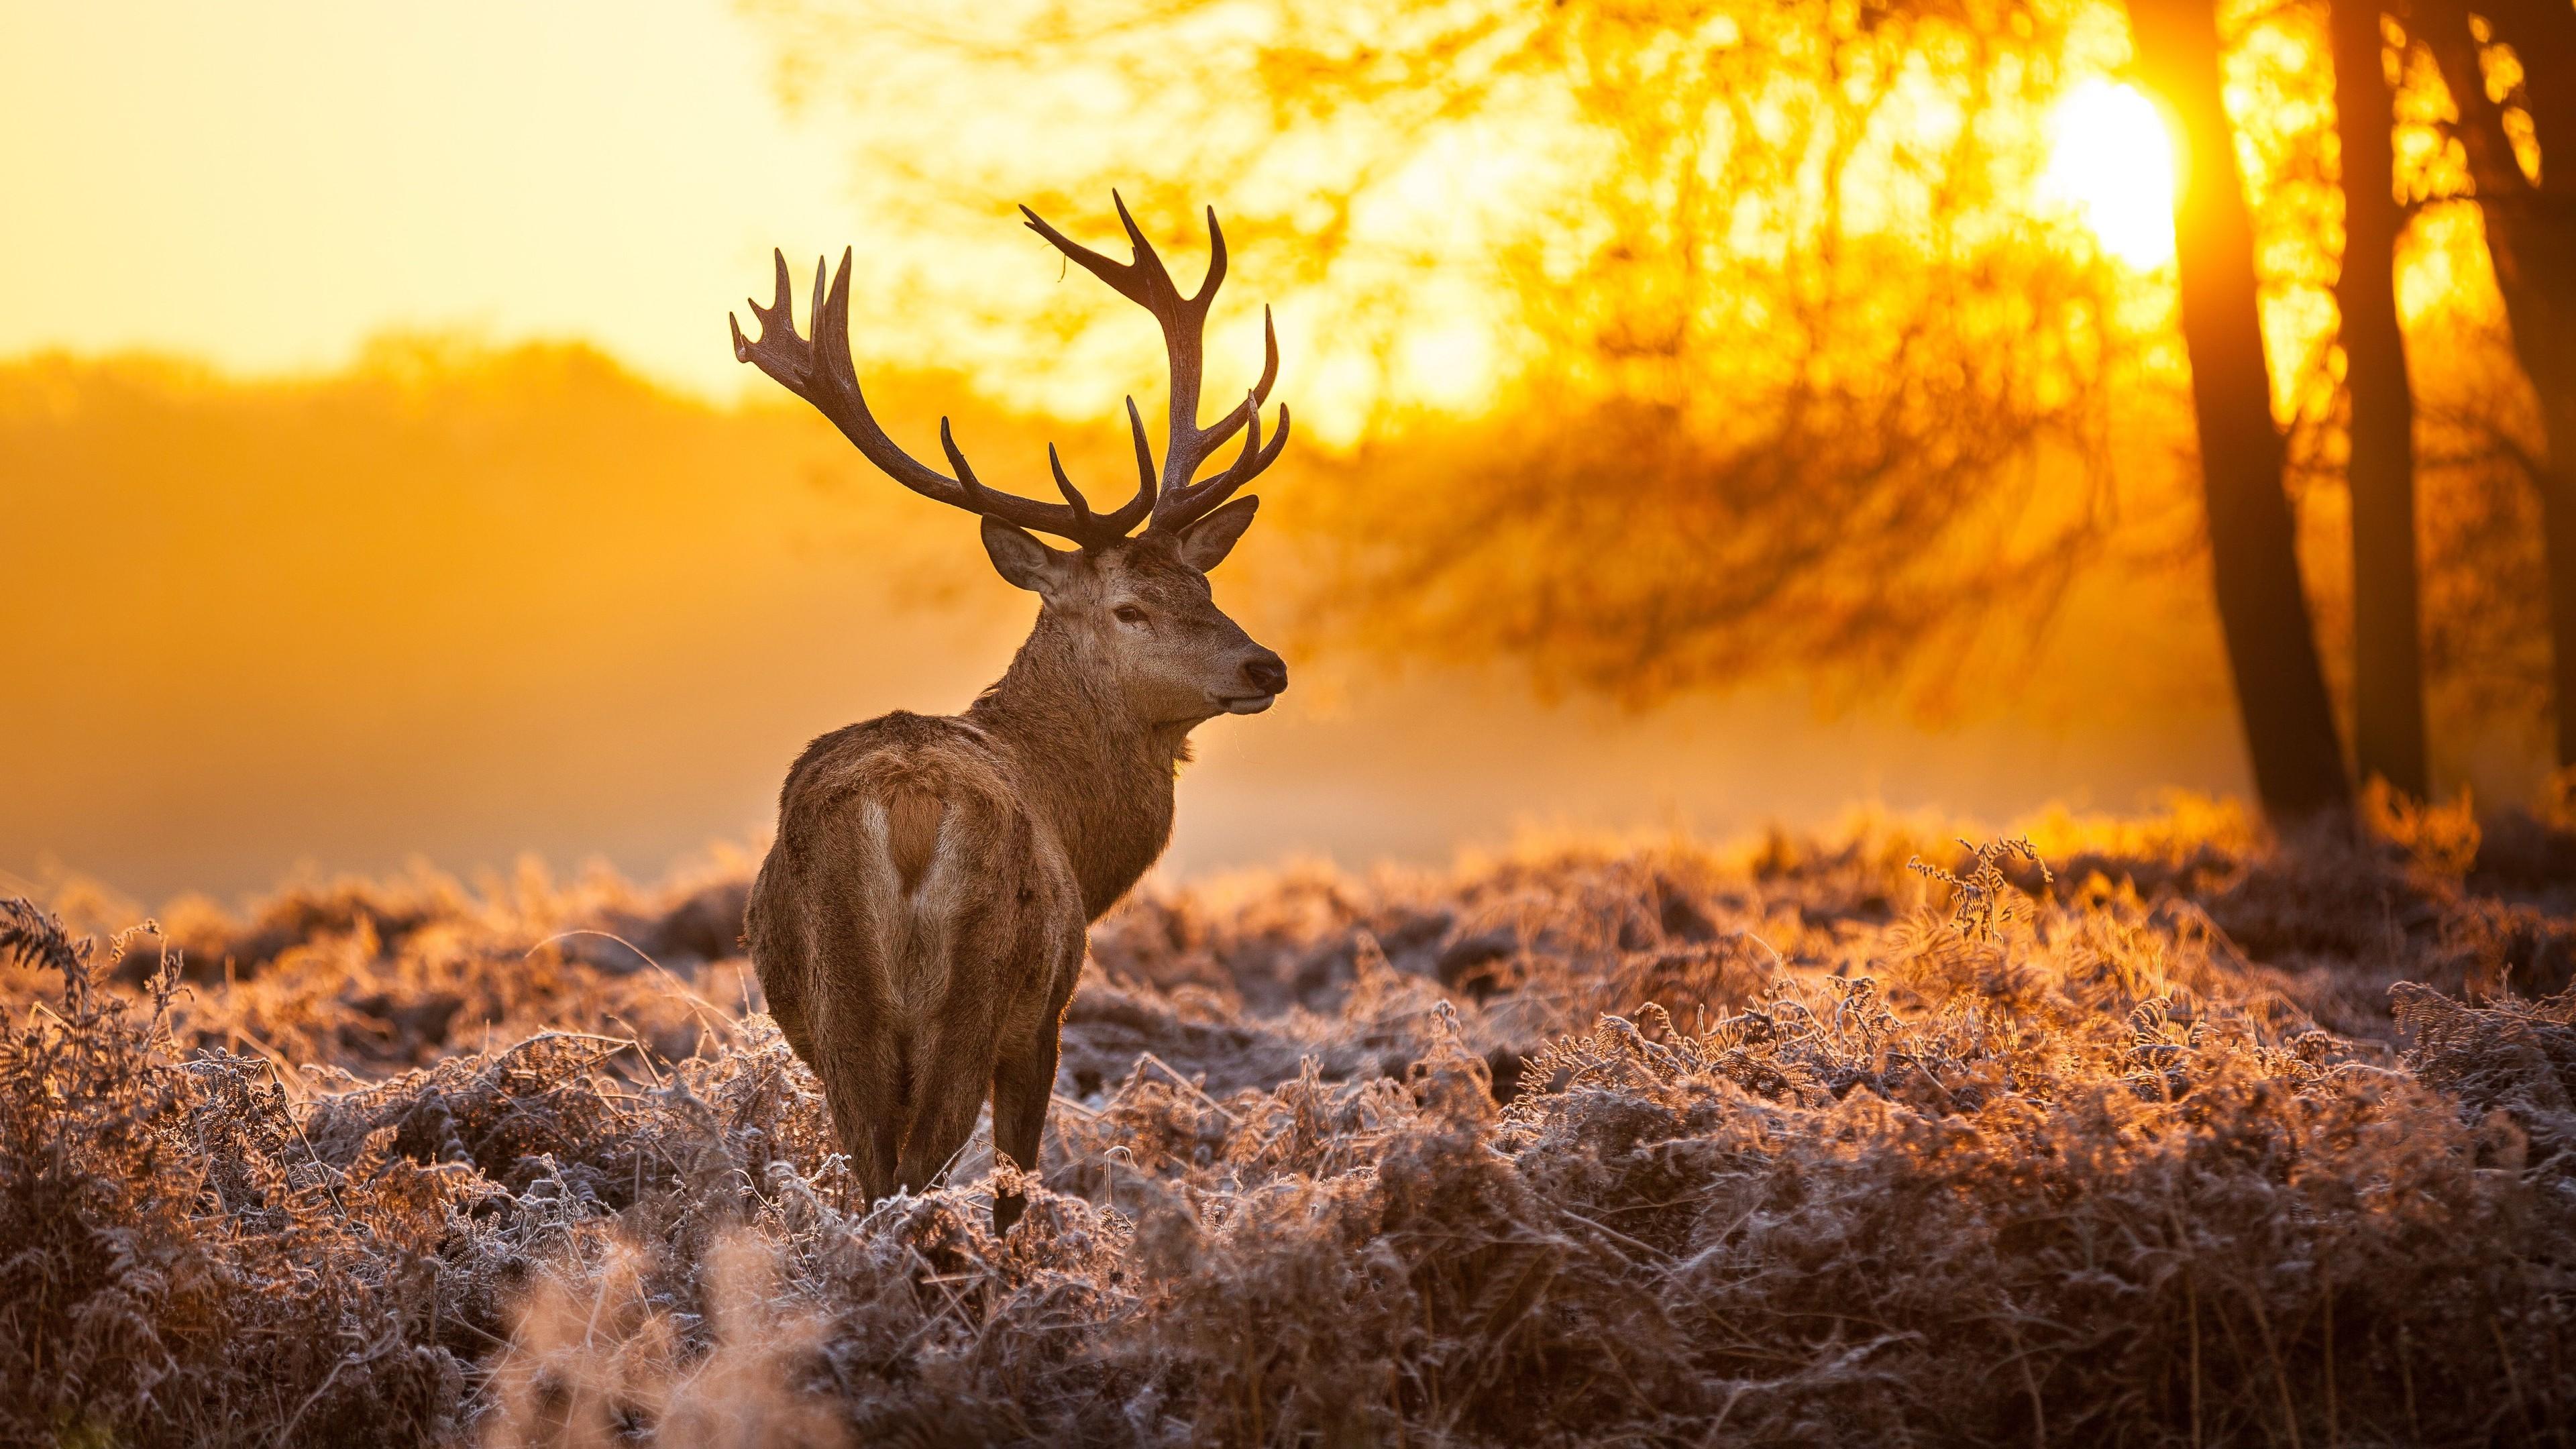 deer in forest 4k 1542237641 - Deer In Forest 4k - forest wallpapers, deer wallpapers, animals wallpapers